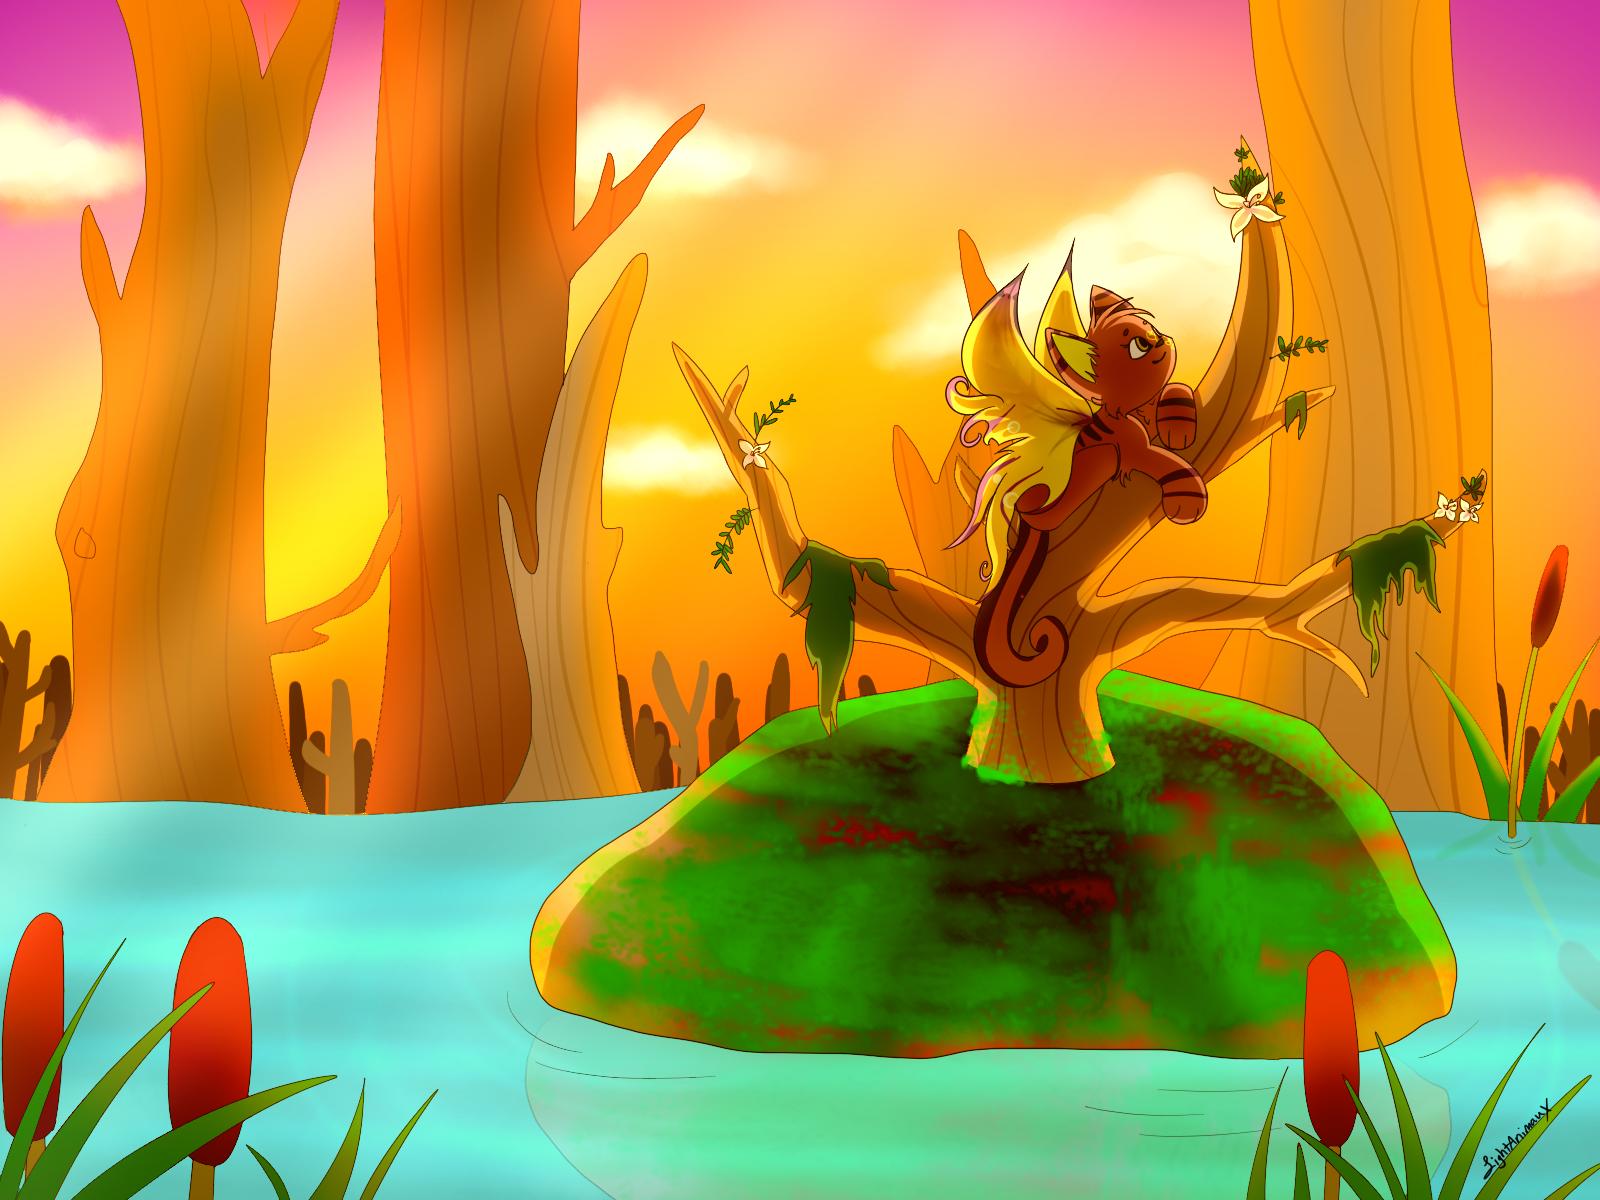 Swamp Sunset by LightAnimaux